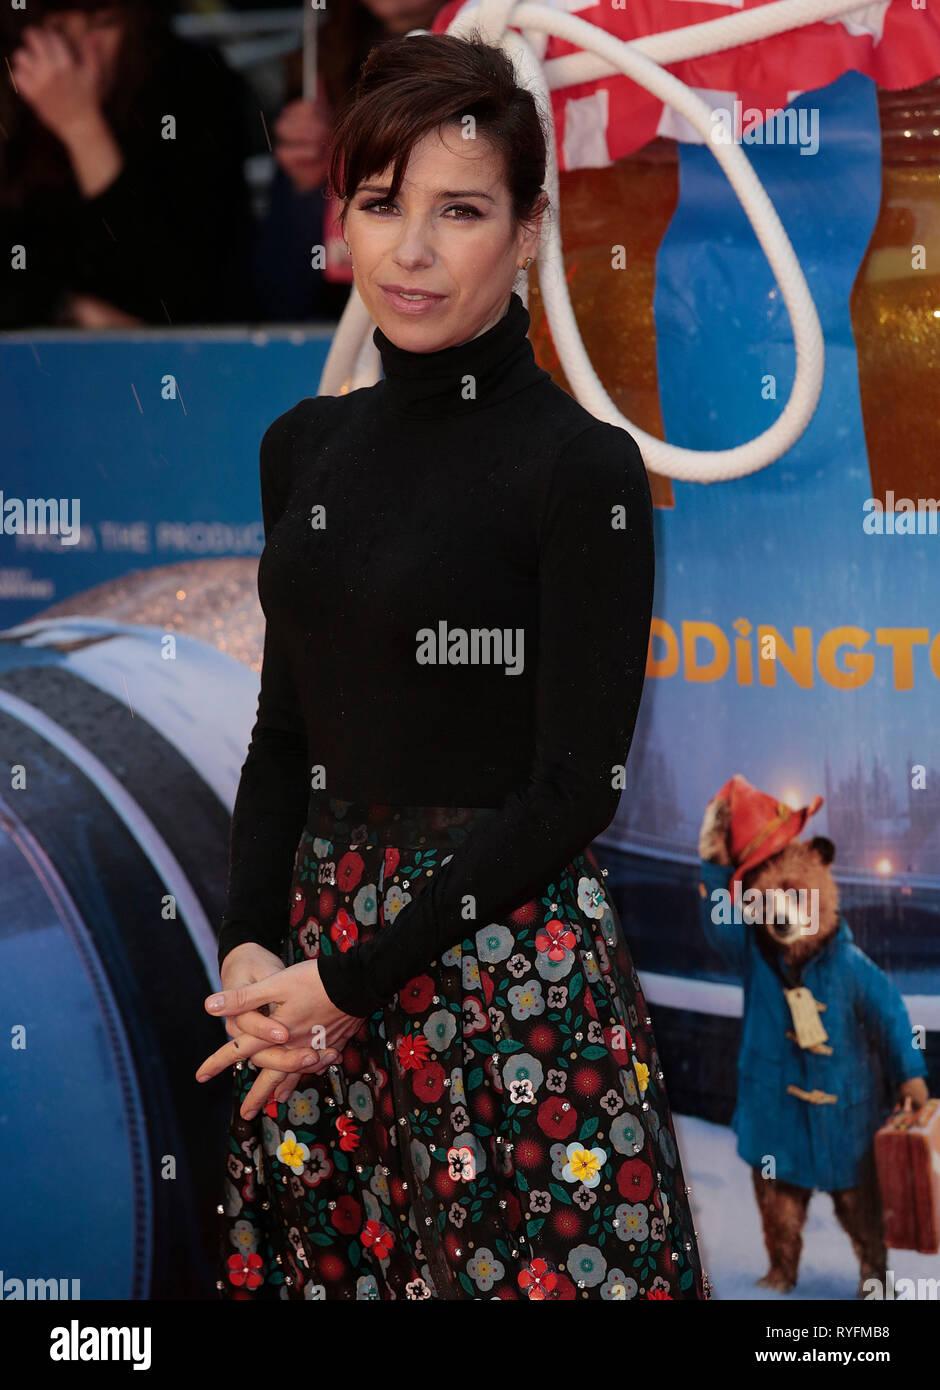 Nov 23, 2014 - London, England, UK - 'Paddington' World Premiere - Red Carpet Arrivals, Odeon, Leicester Square Photo Shows: Sally Hawkins - Stock Image